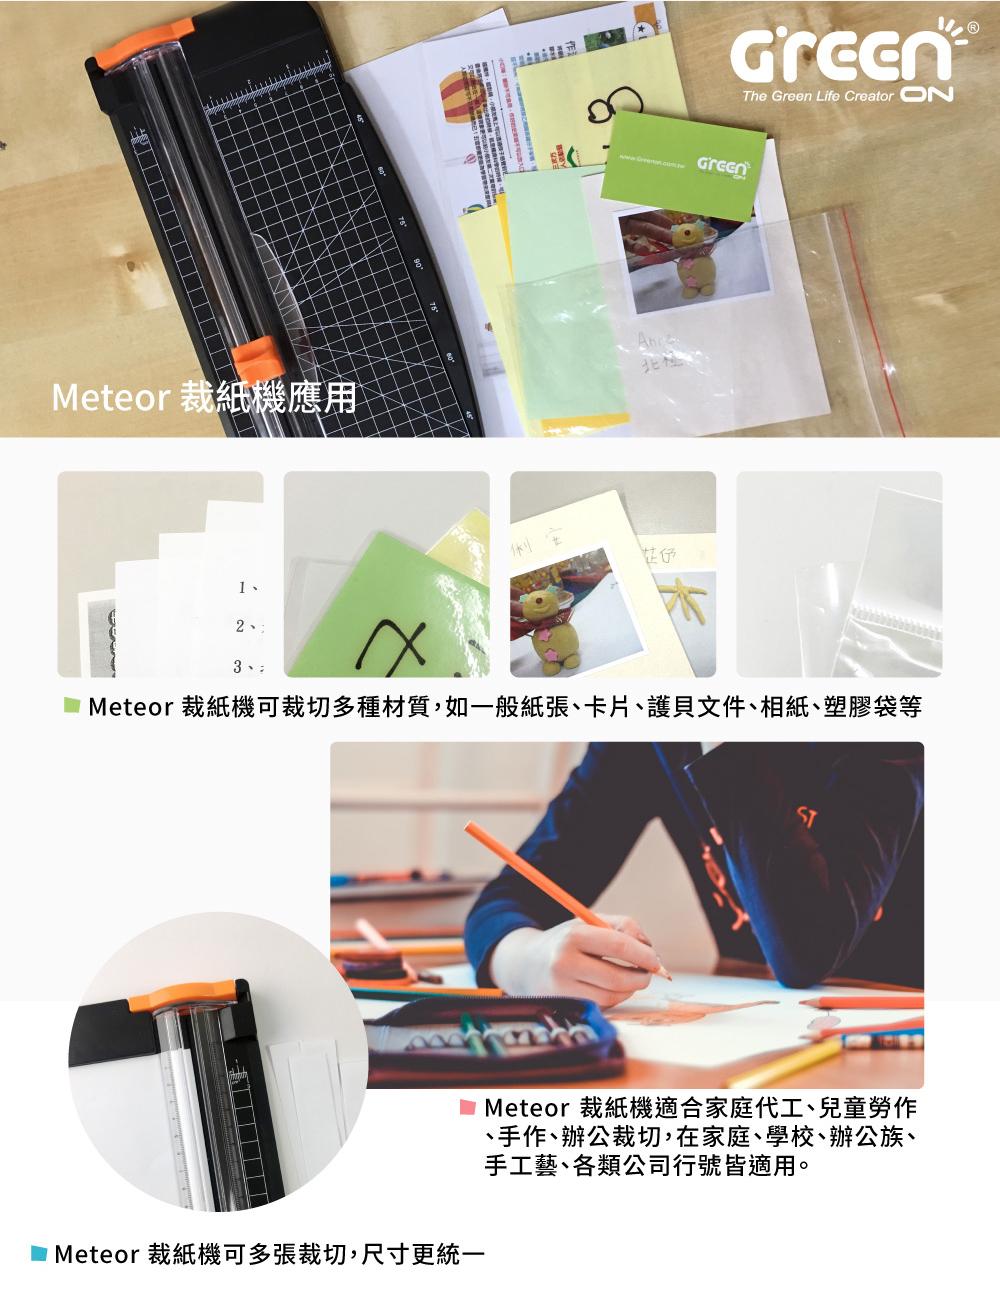 Meteor 裁紙機  裁切多種材質 可多張裁切